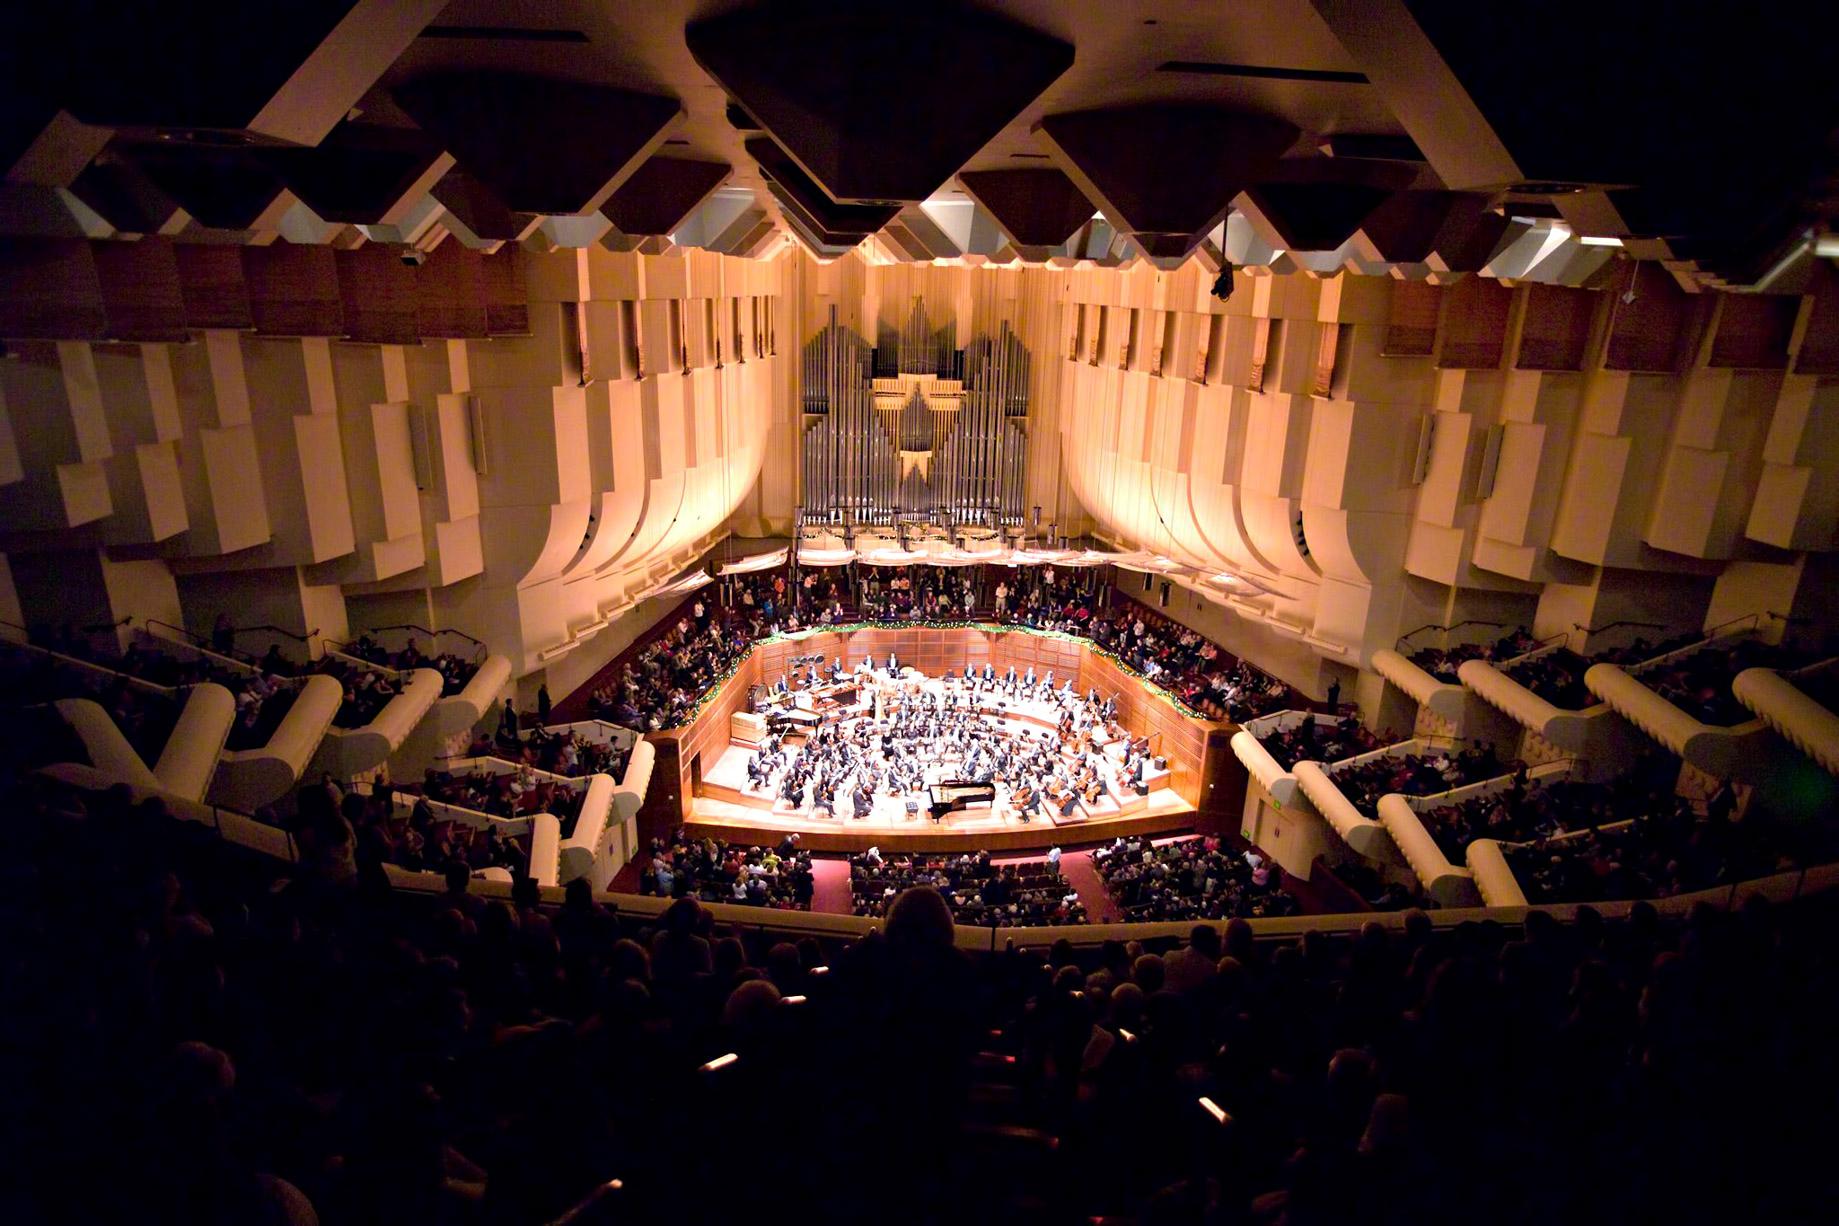 San Francisco Symphony - 201 Van Ness Ave, San Francisco, CA, USA